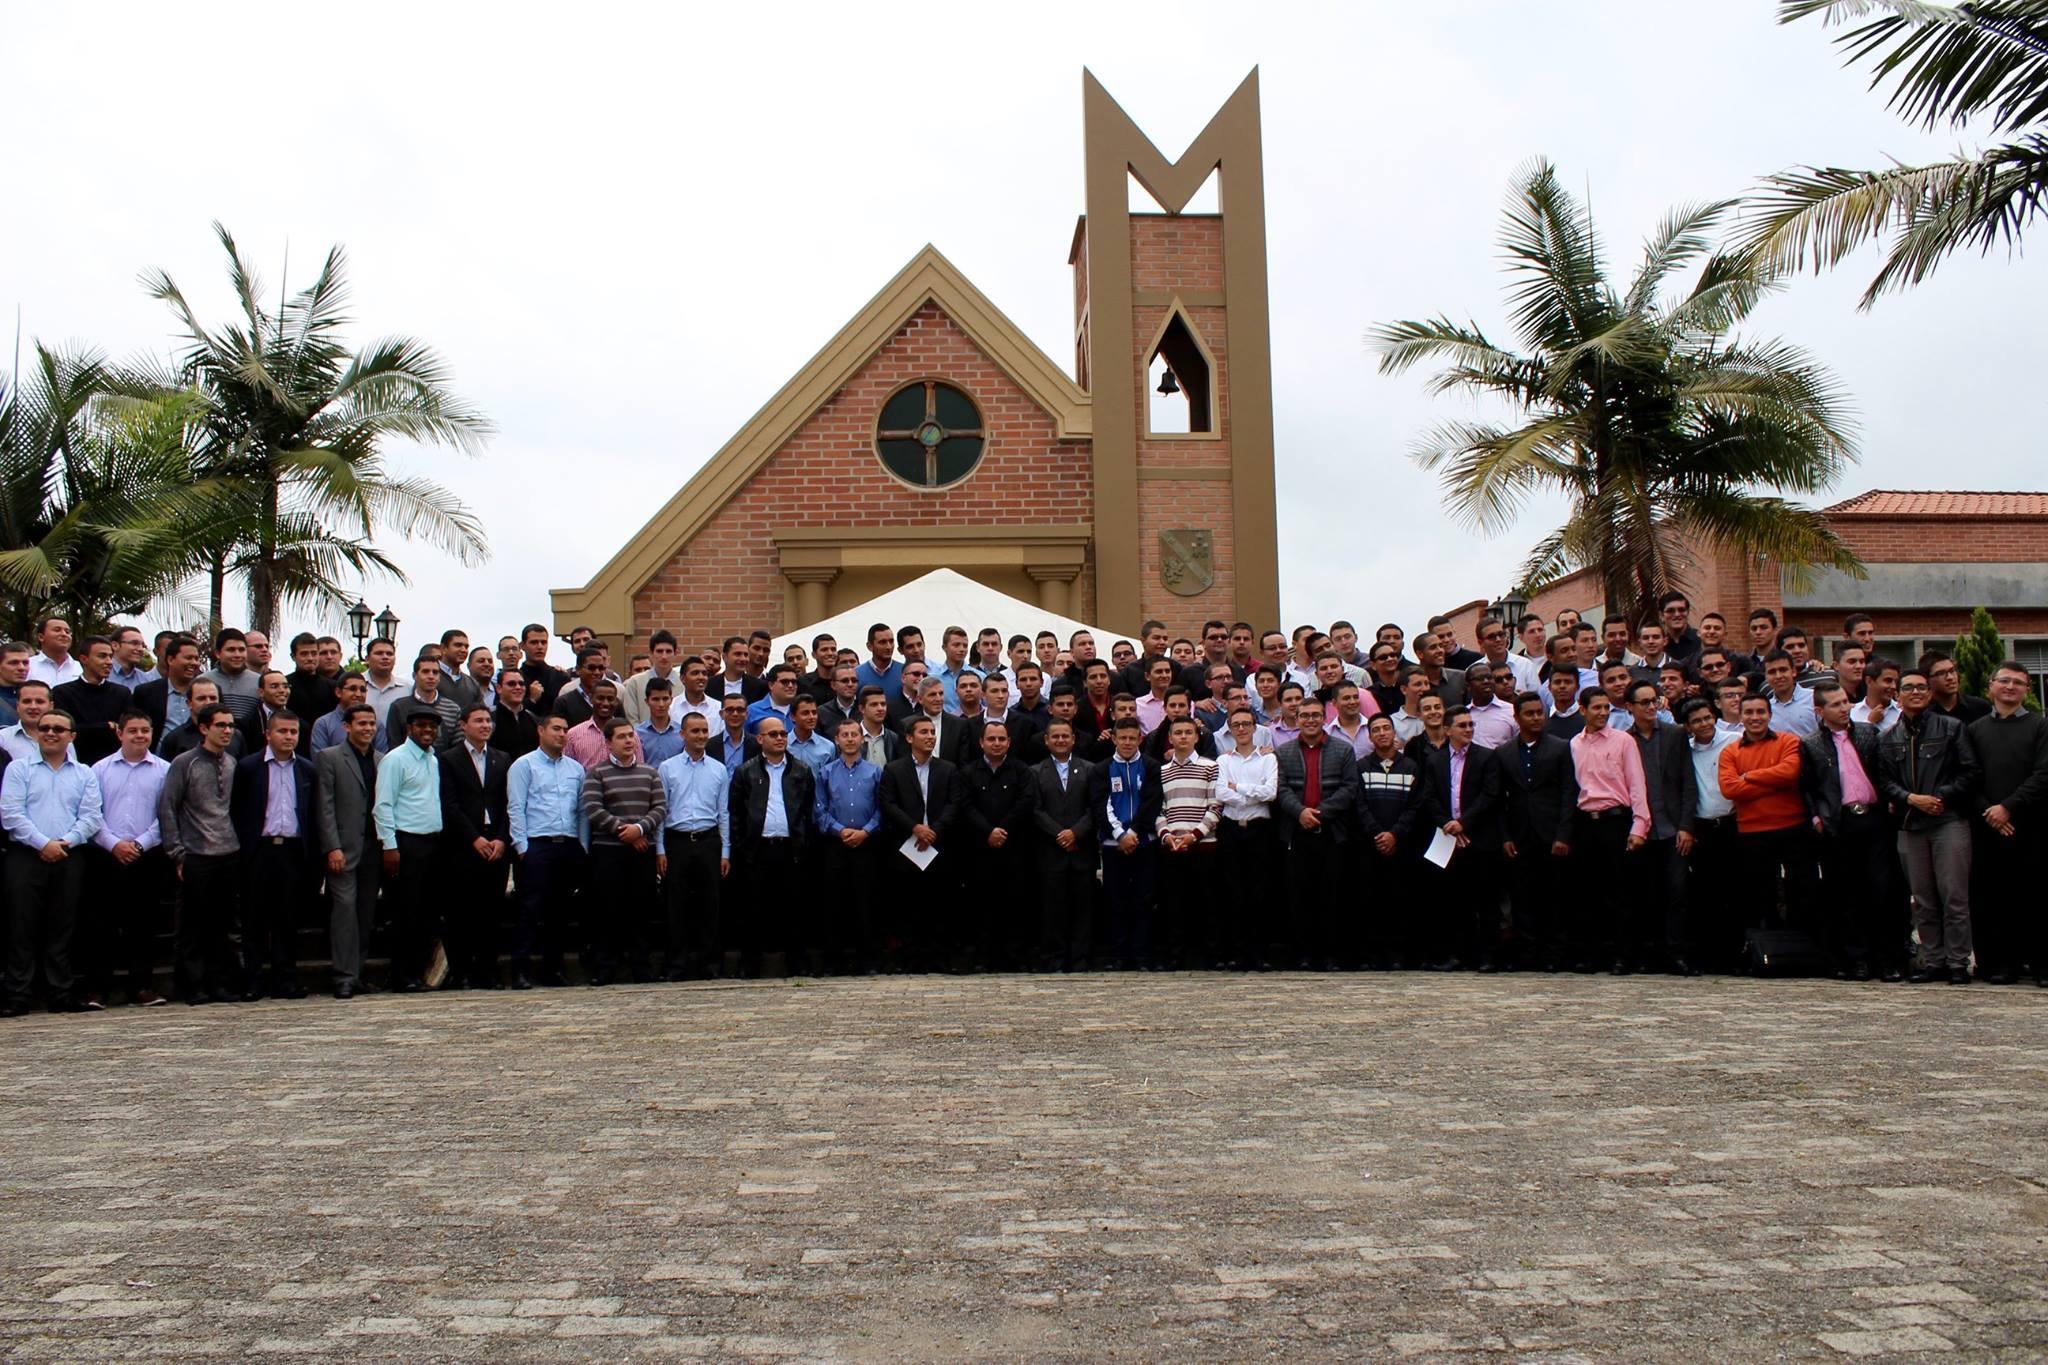 Proyecto: En Colombia 91 sacerdotes reciben formación, ACN apoya